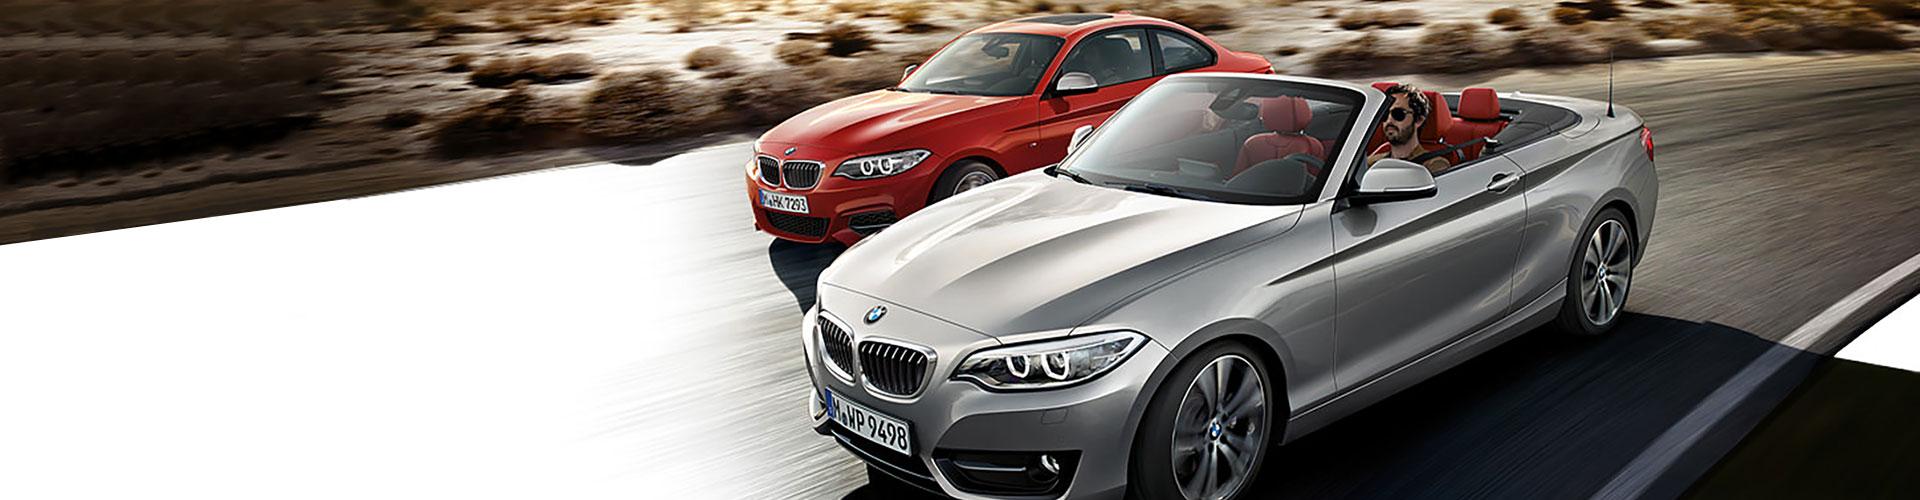 Neuer BMW 2er Cabrio